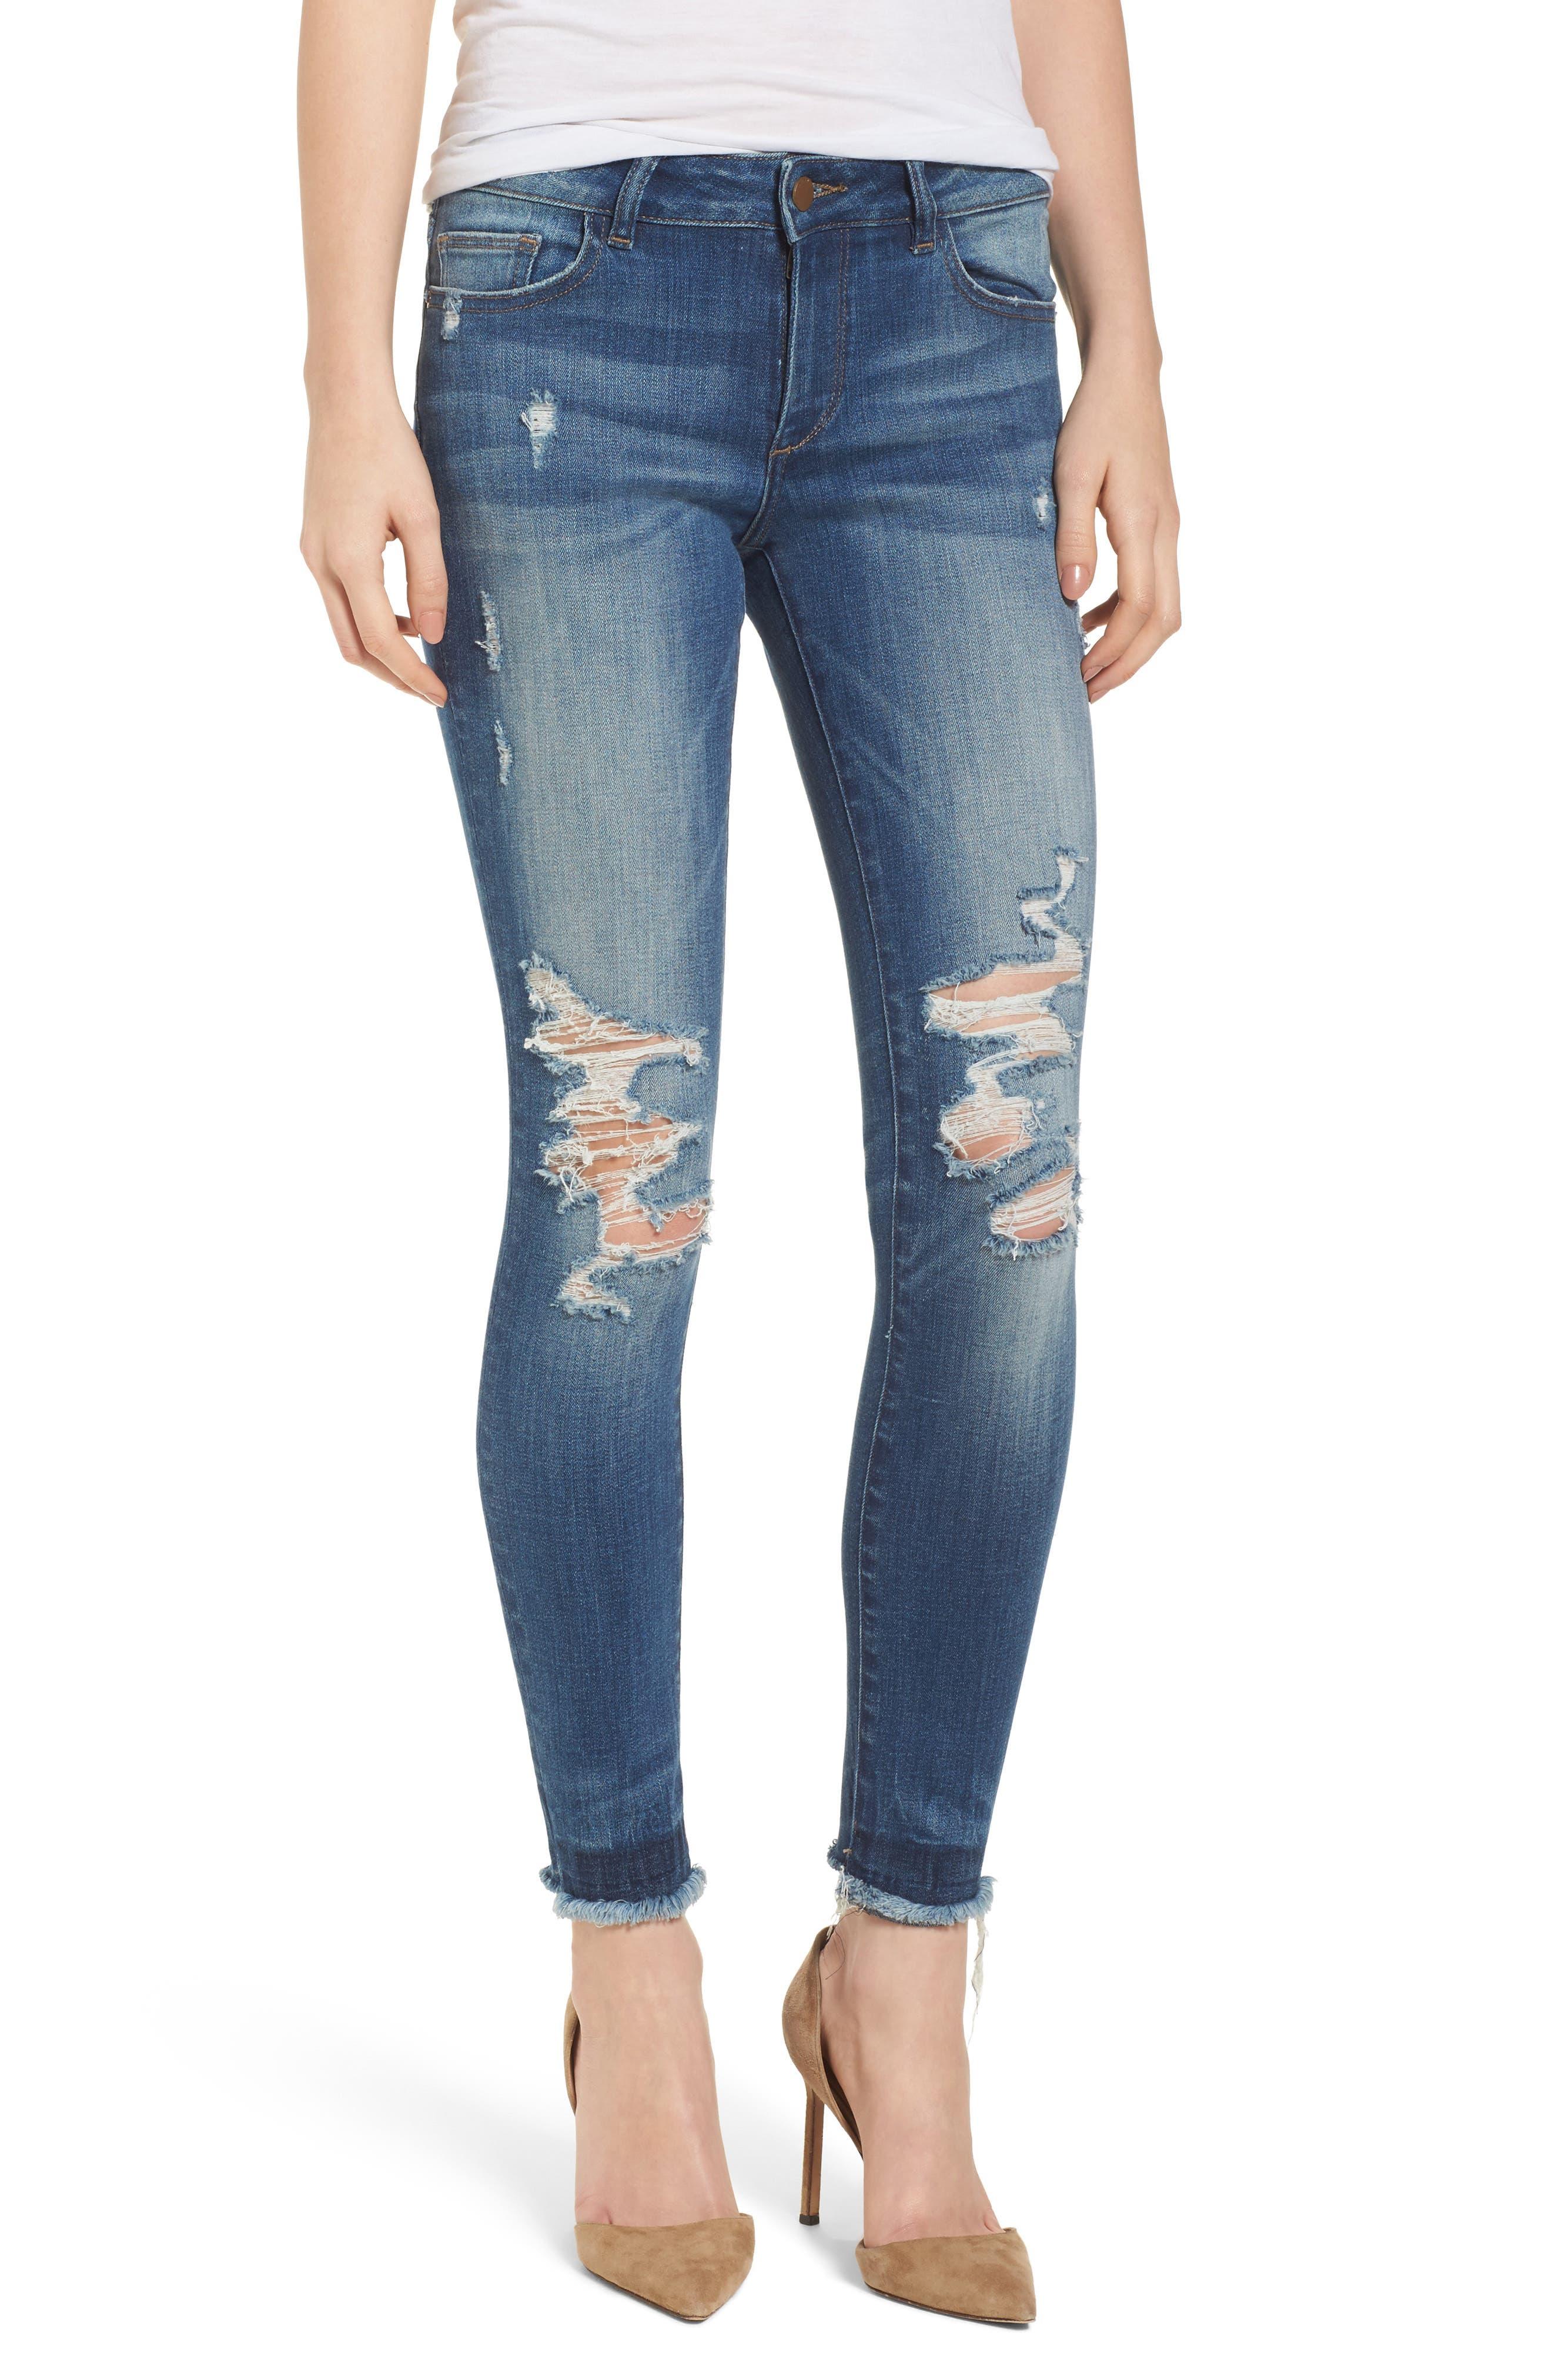 Emma Power Legging Jeans,                             Main thumbnail 1, color,                             Westwood